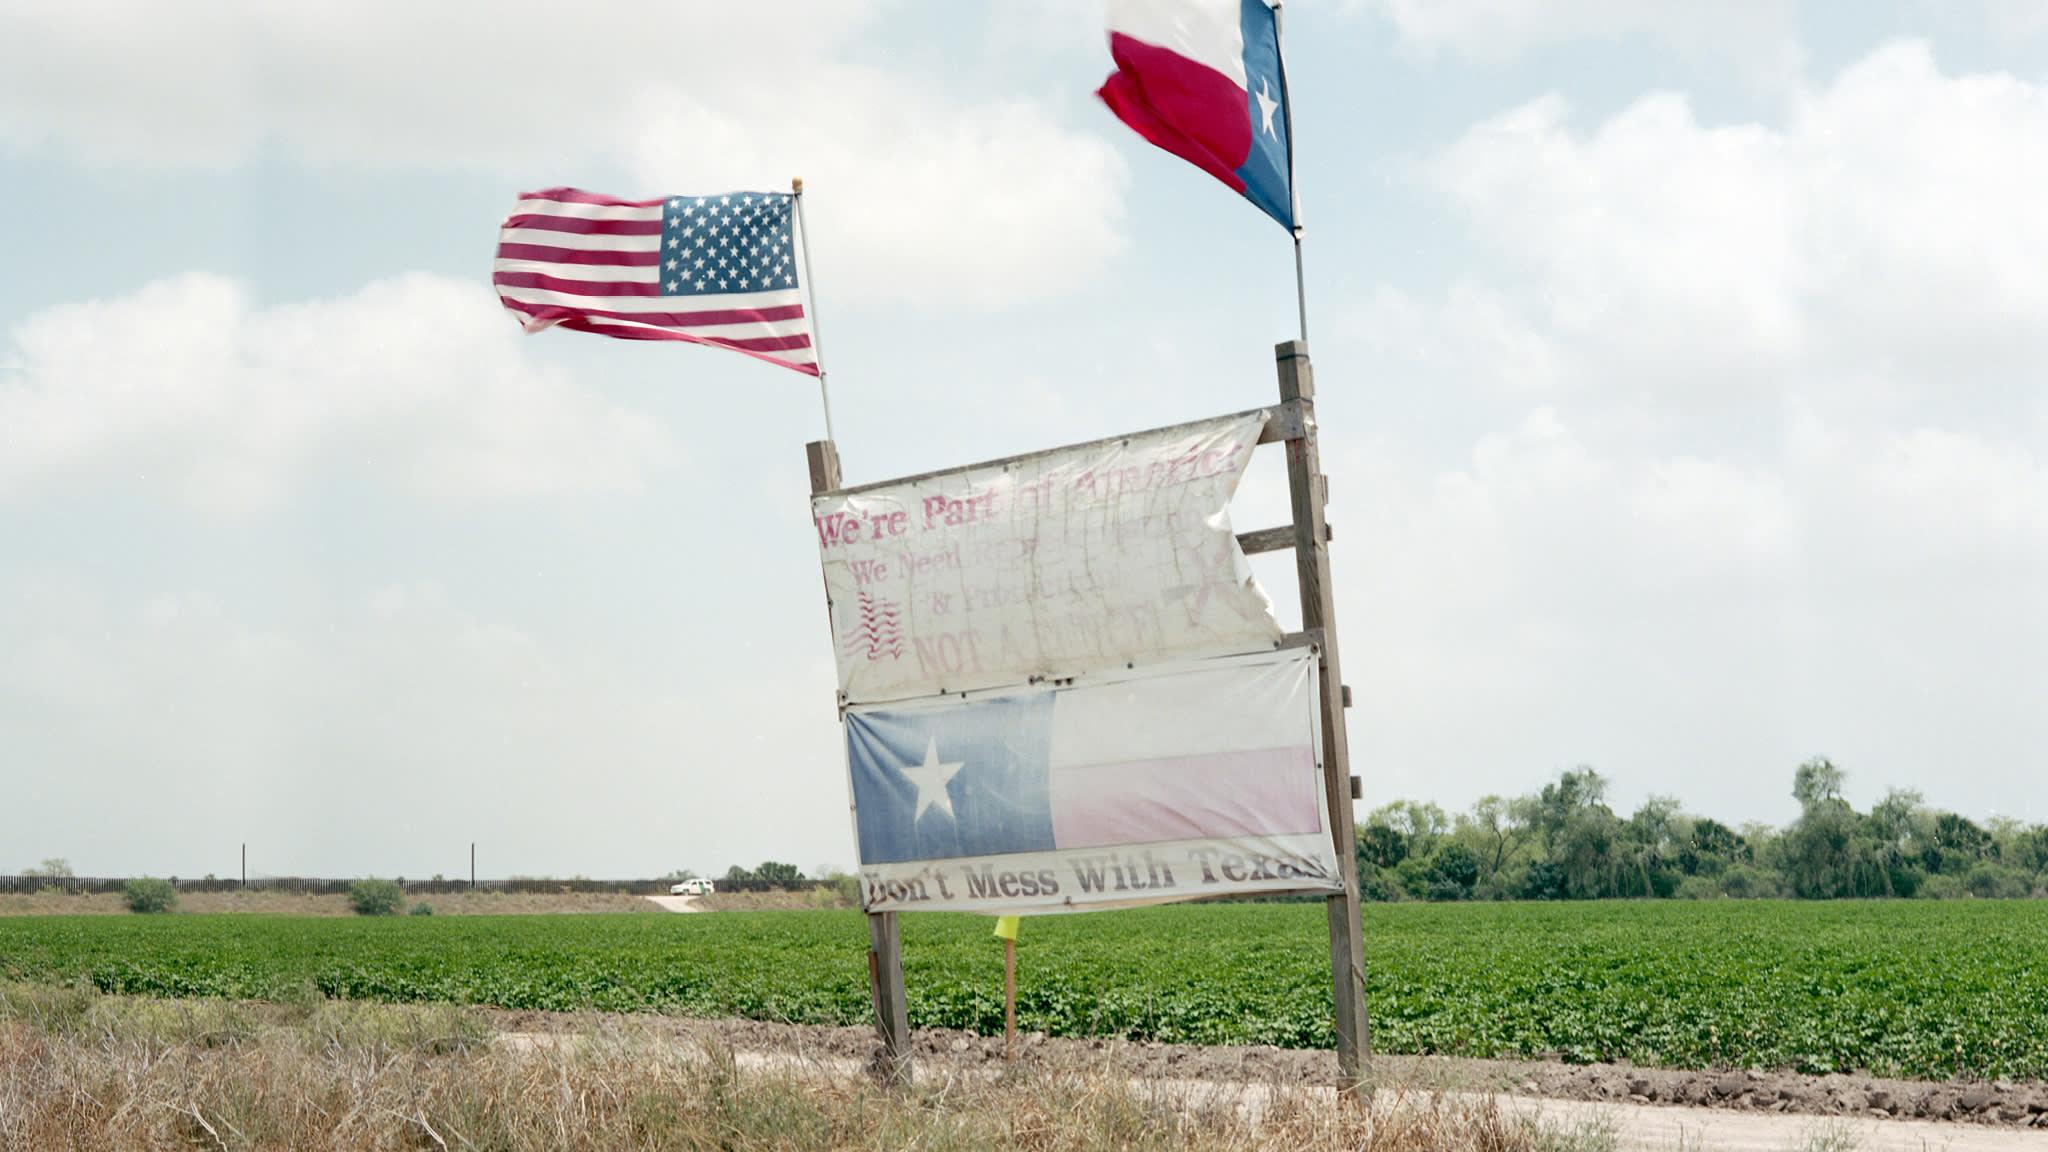 Life on the edge at Trump's border